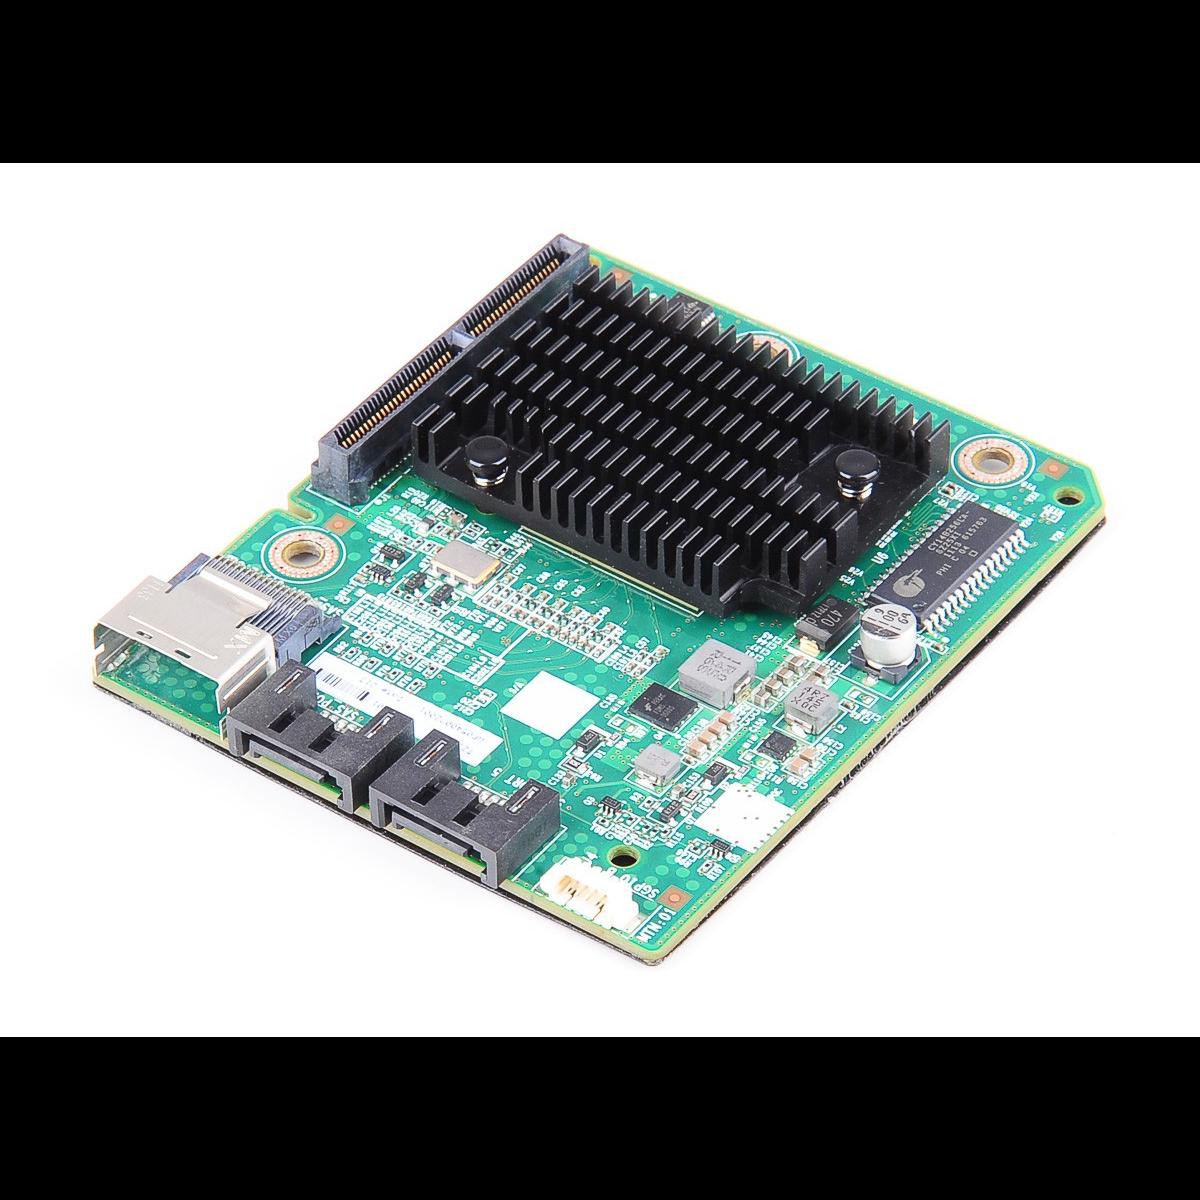 RAID-контроллер LSI 2008 для серверов Dell C6100, SAS 6 Gb/s